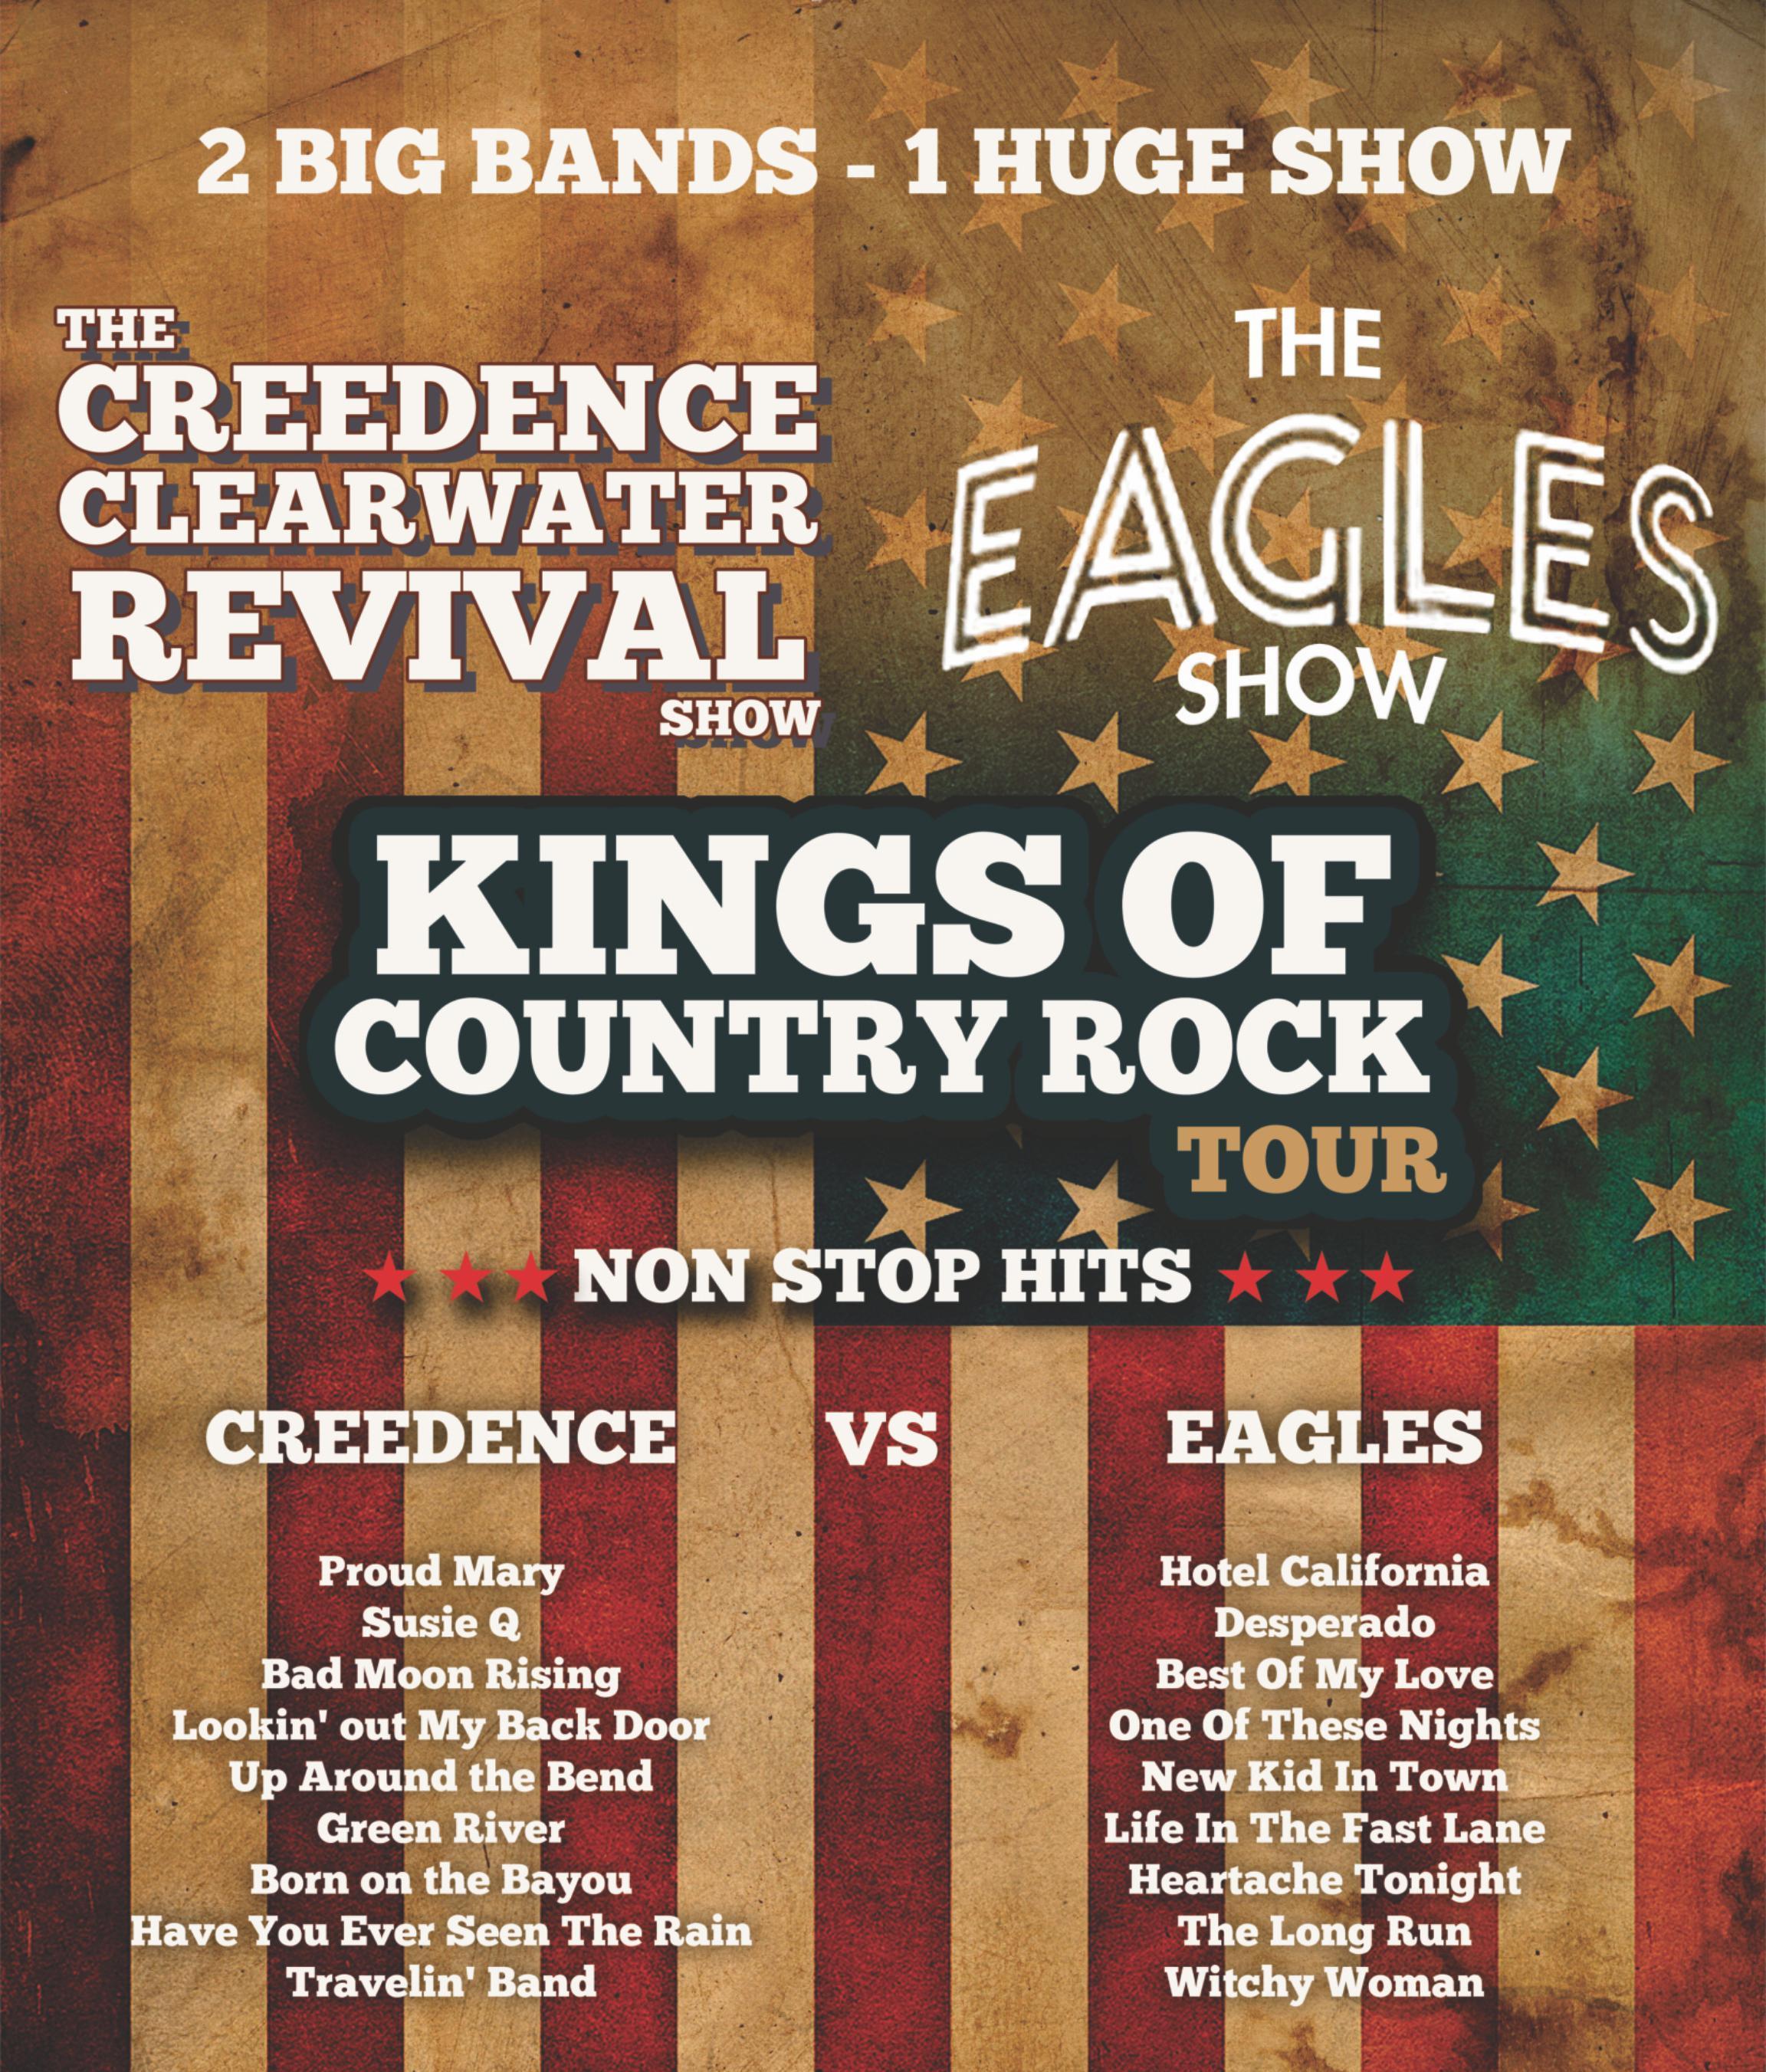 Kings of country rock poster art.jpg